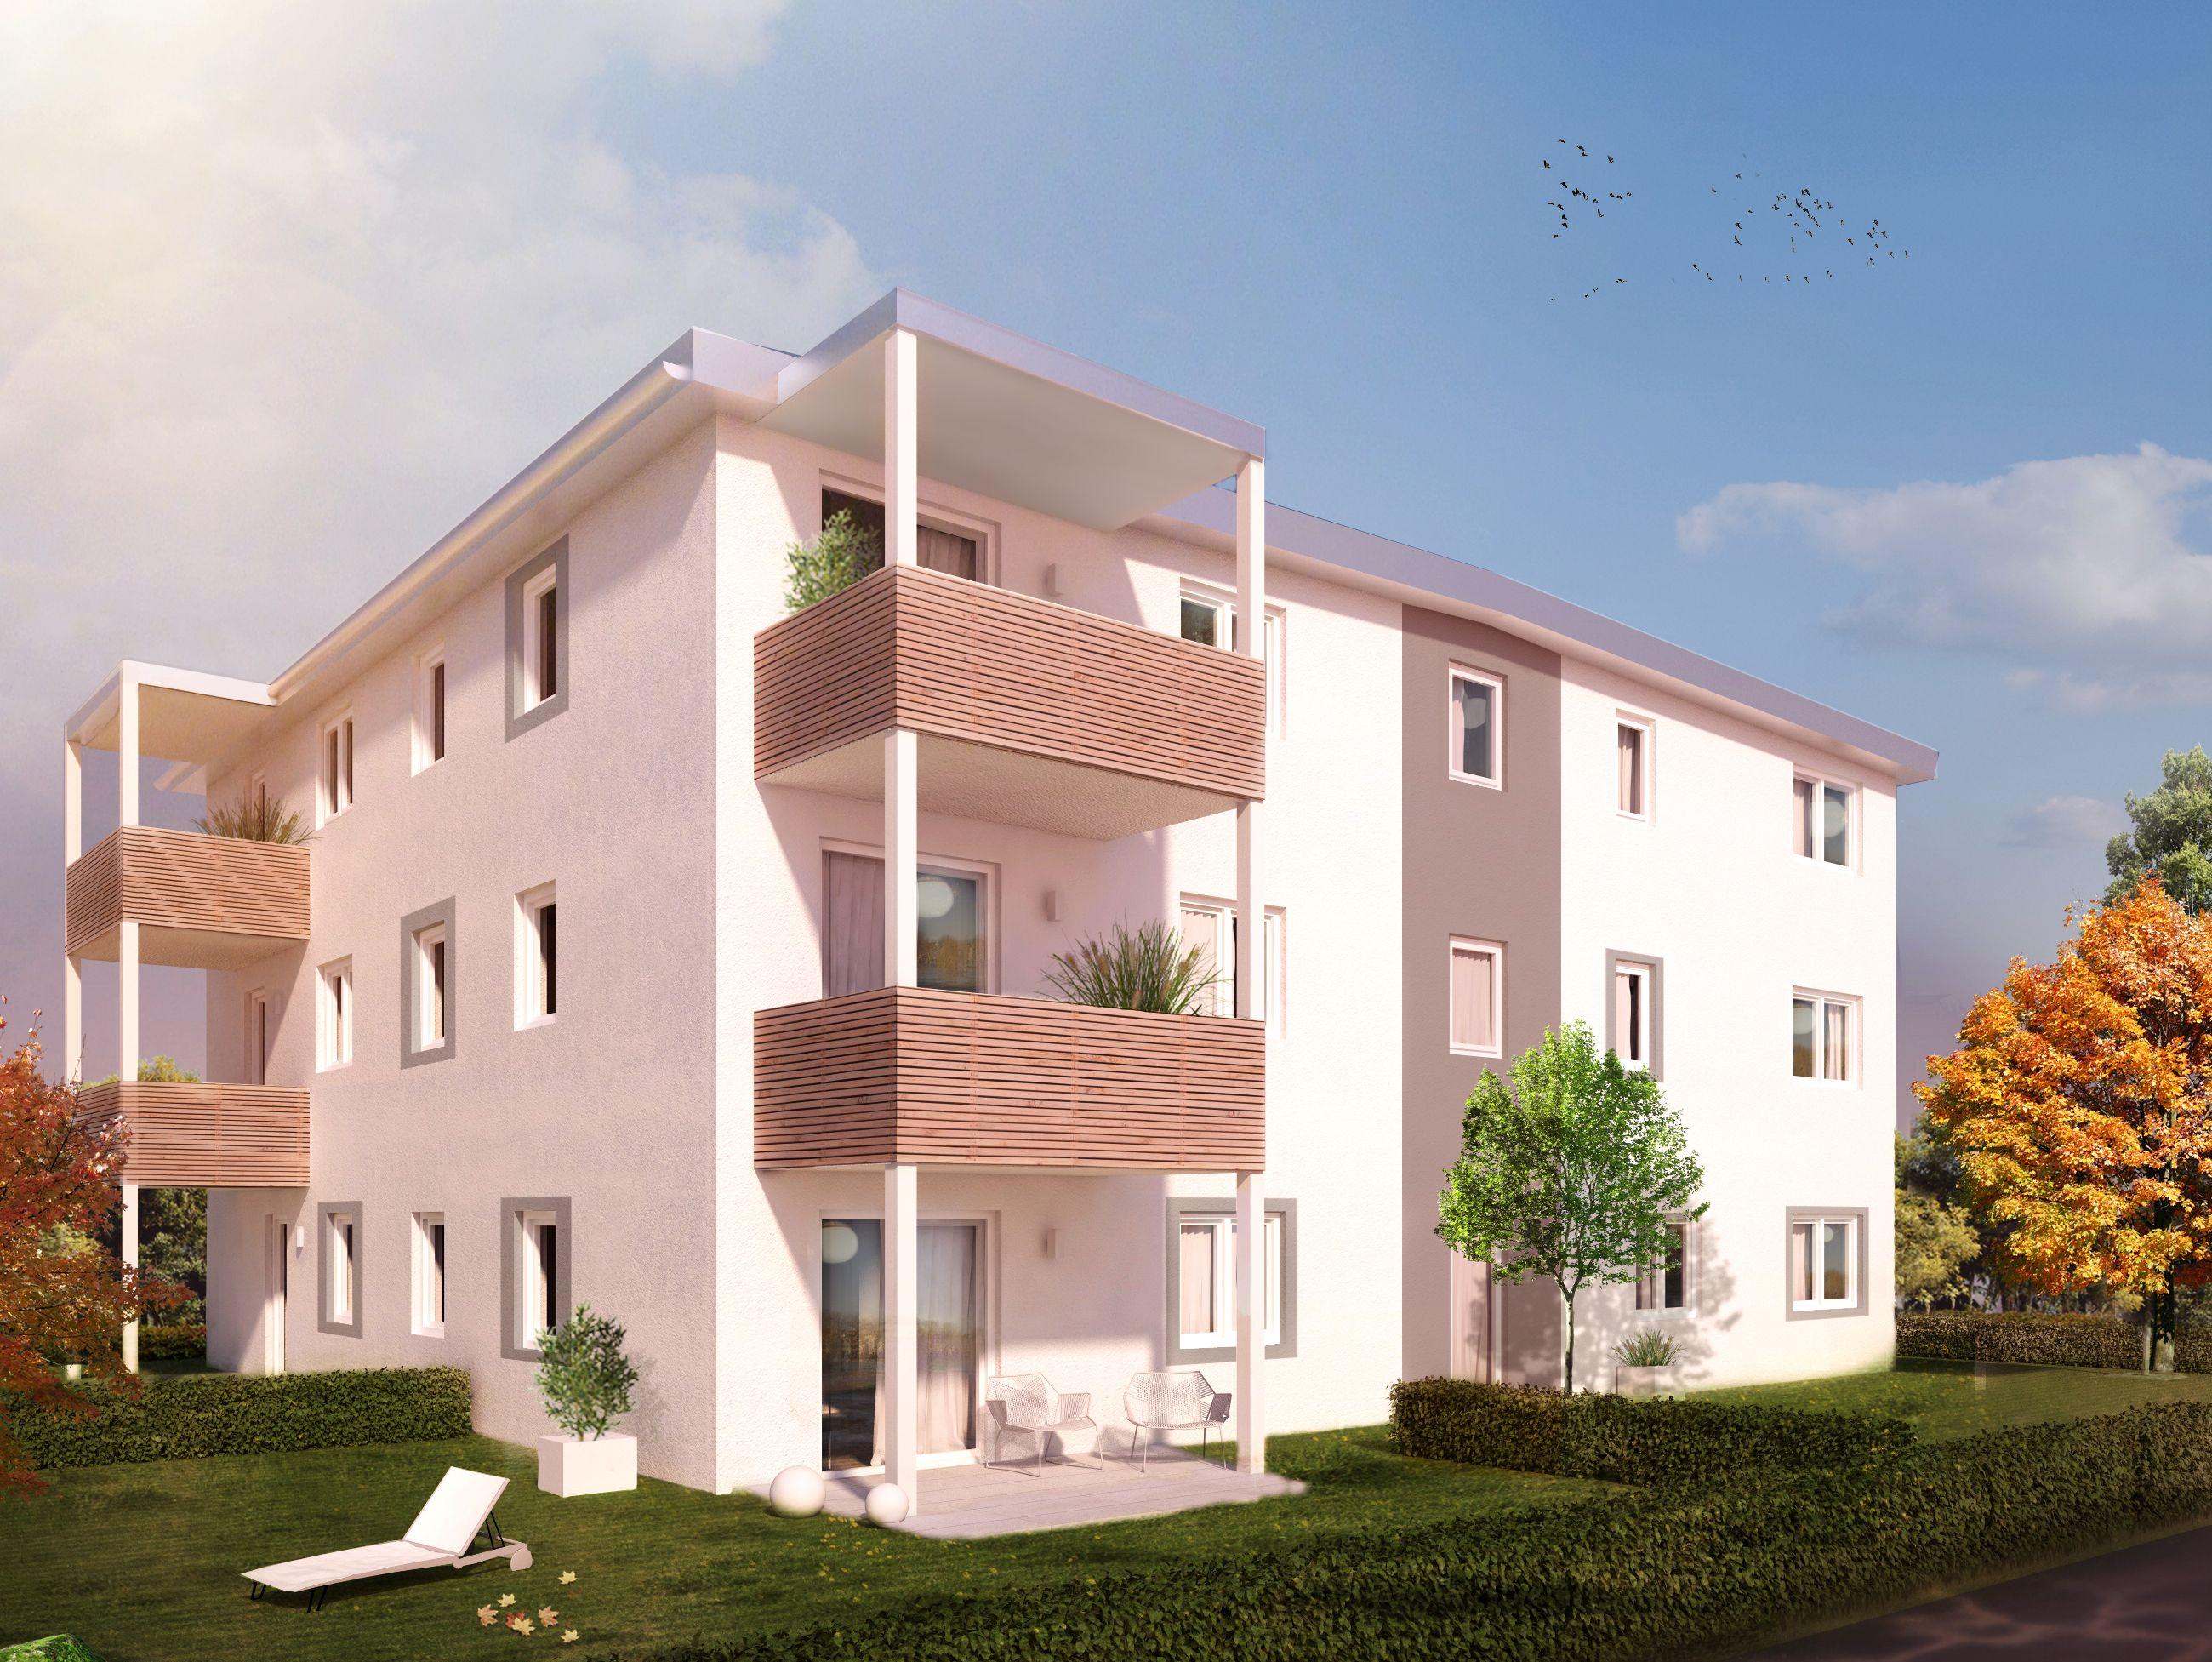 Leistbares Wohnen in Hartberg